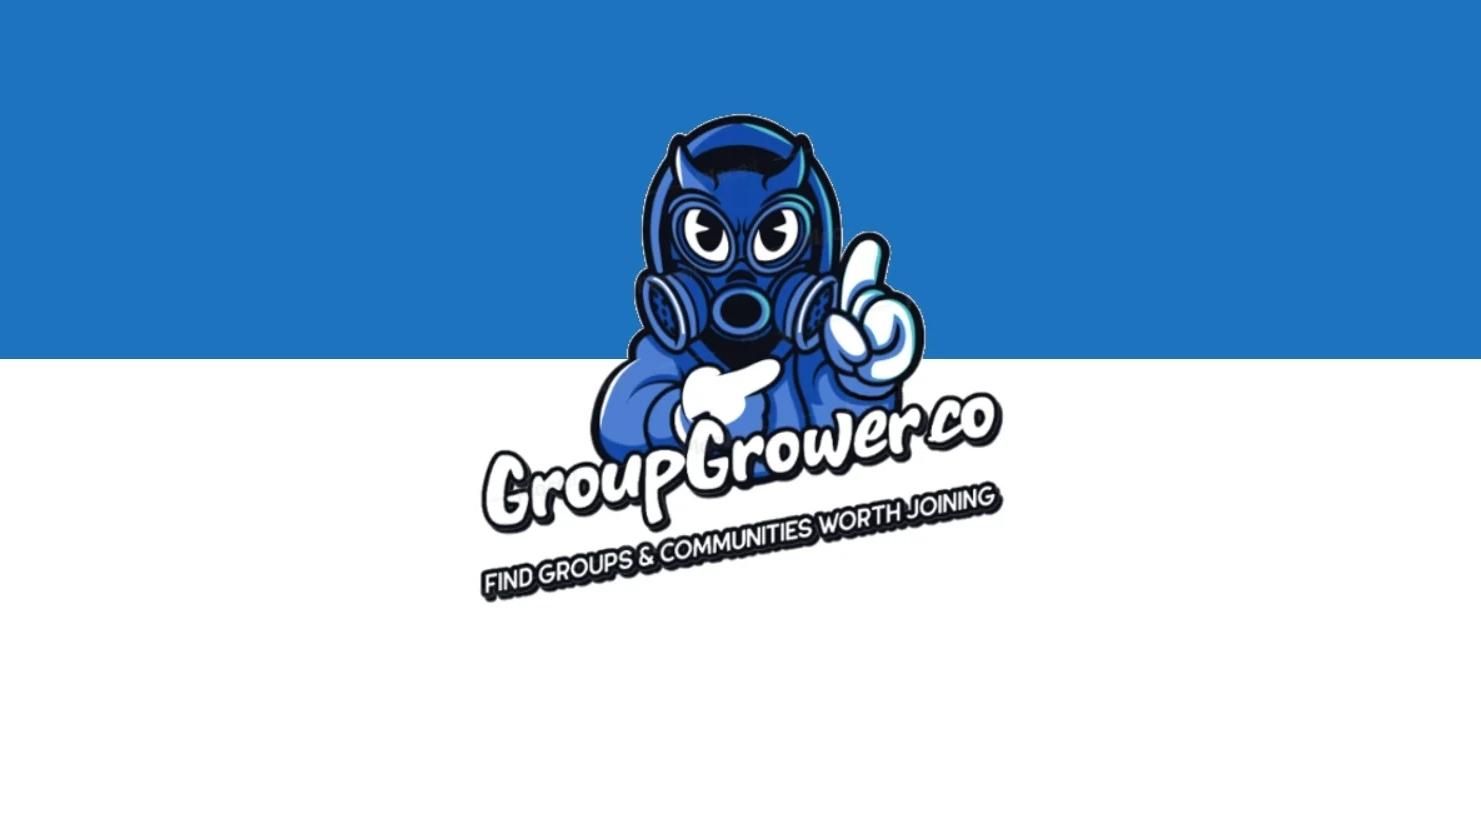 grouppowerco